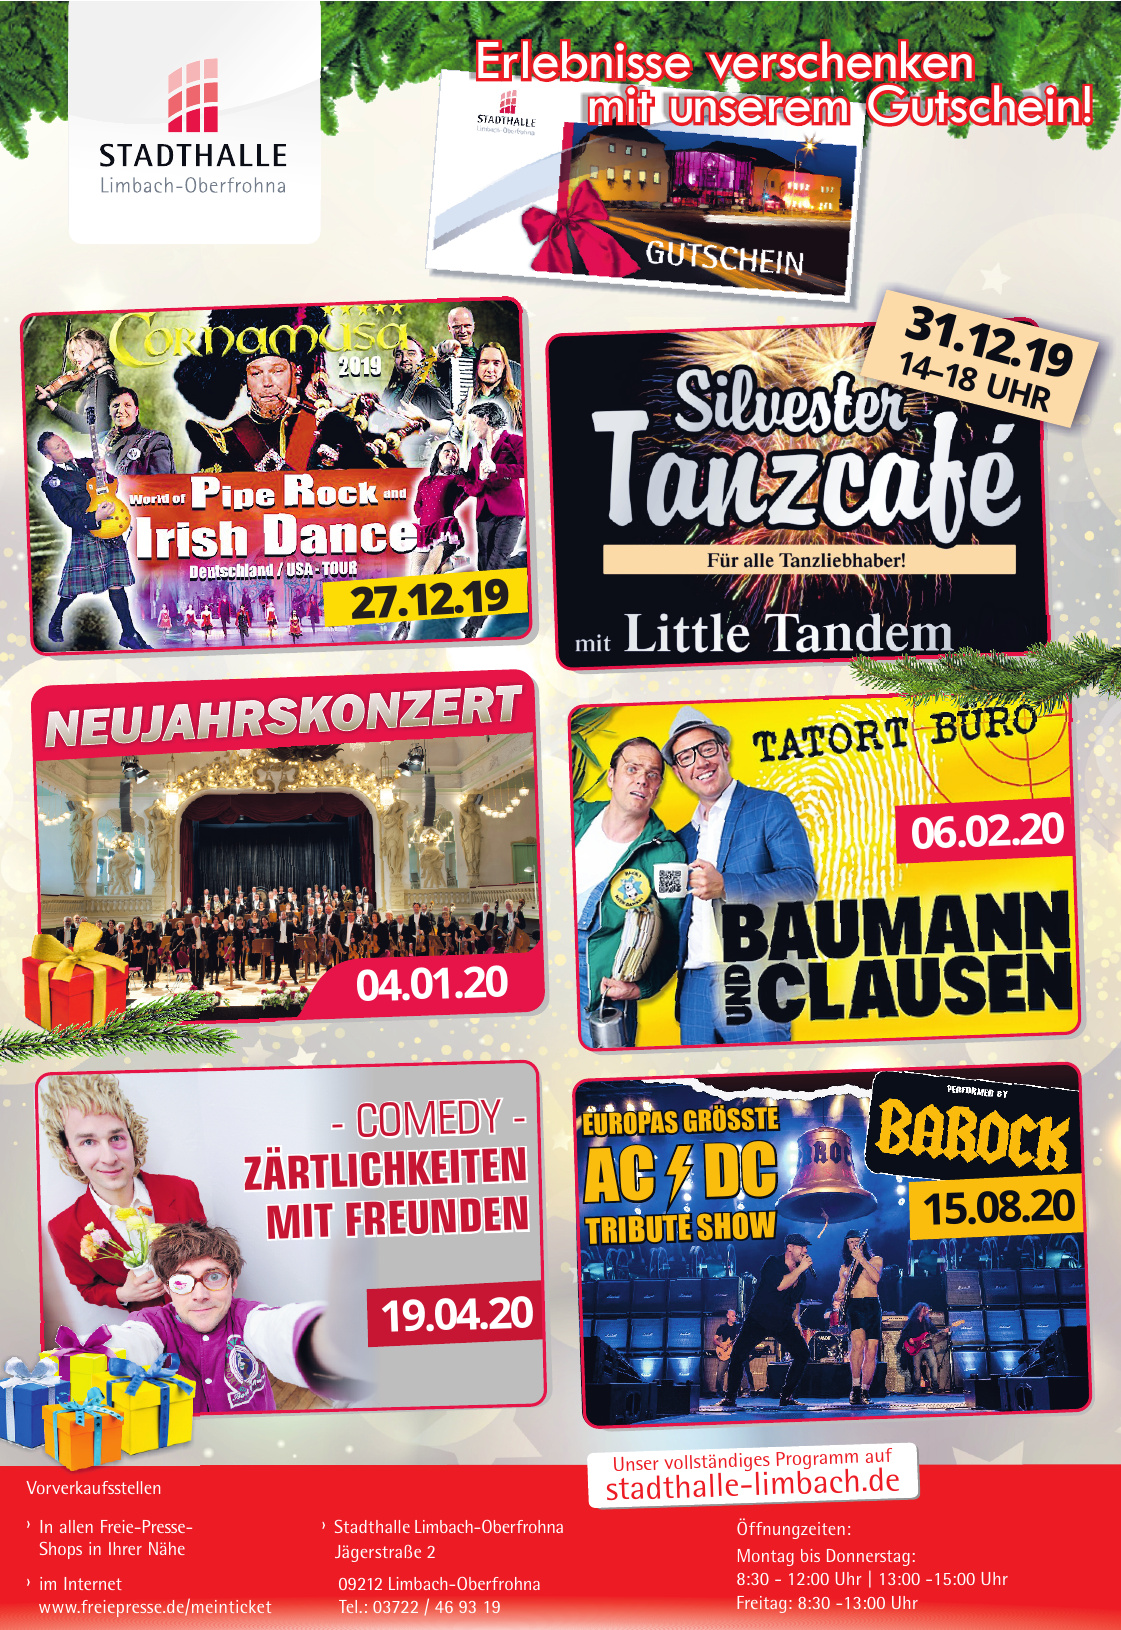 Stadthalle Limbach-Oberfrohna